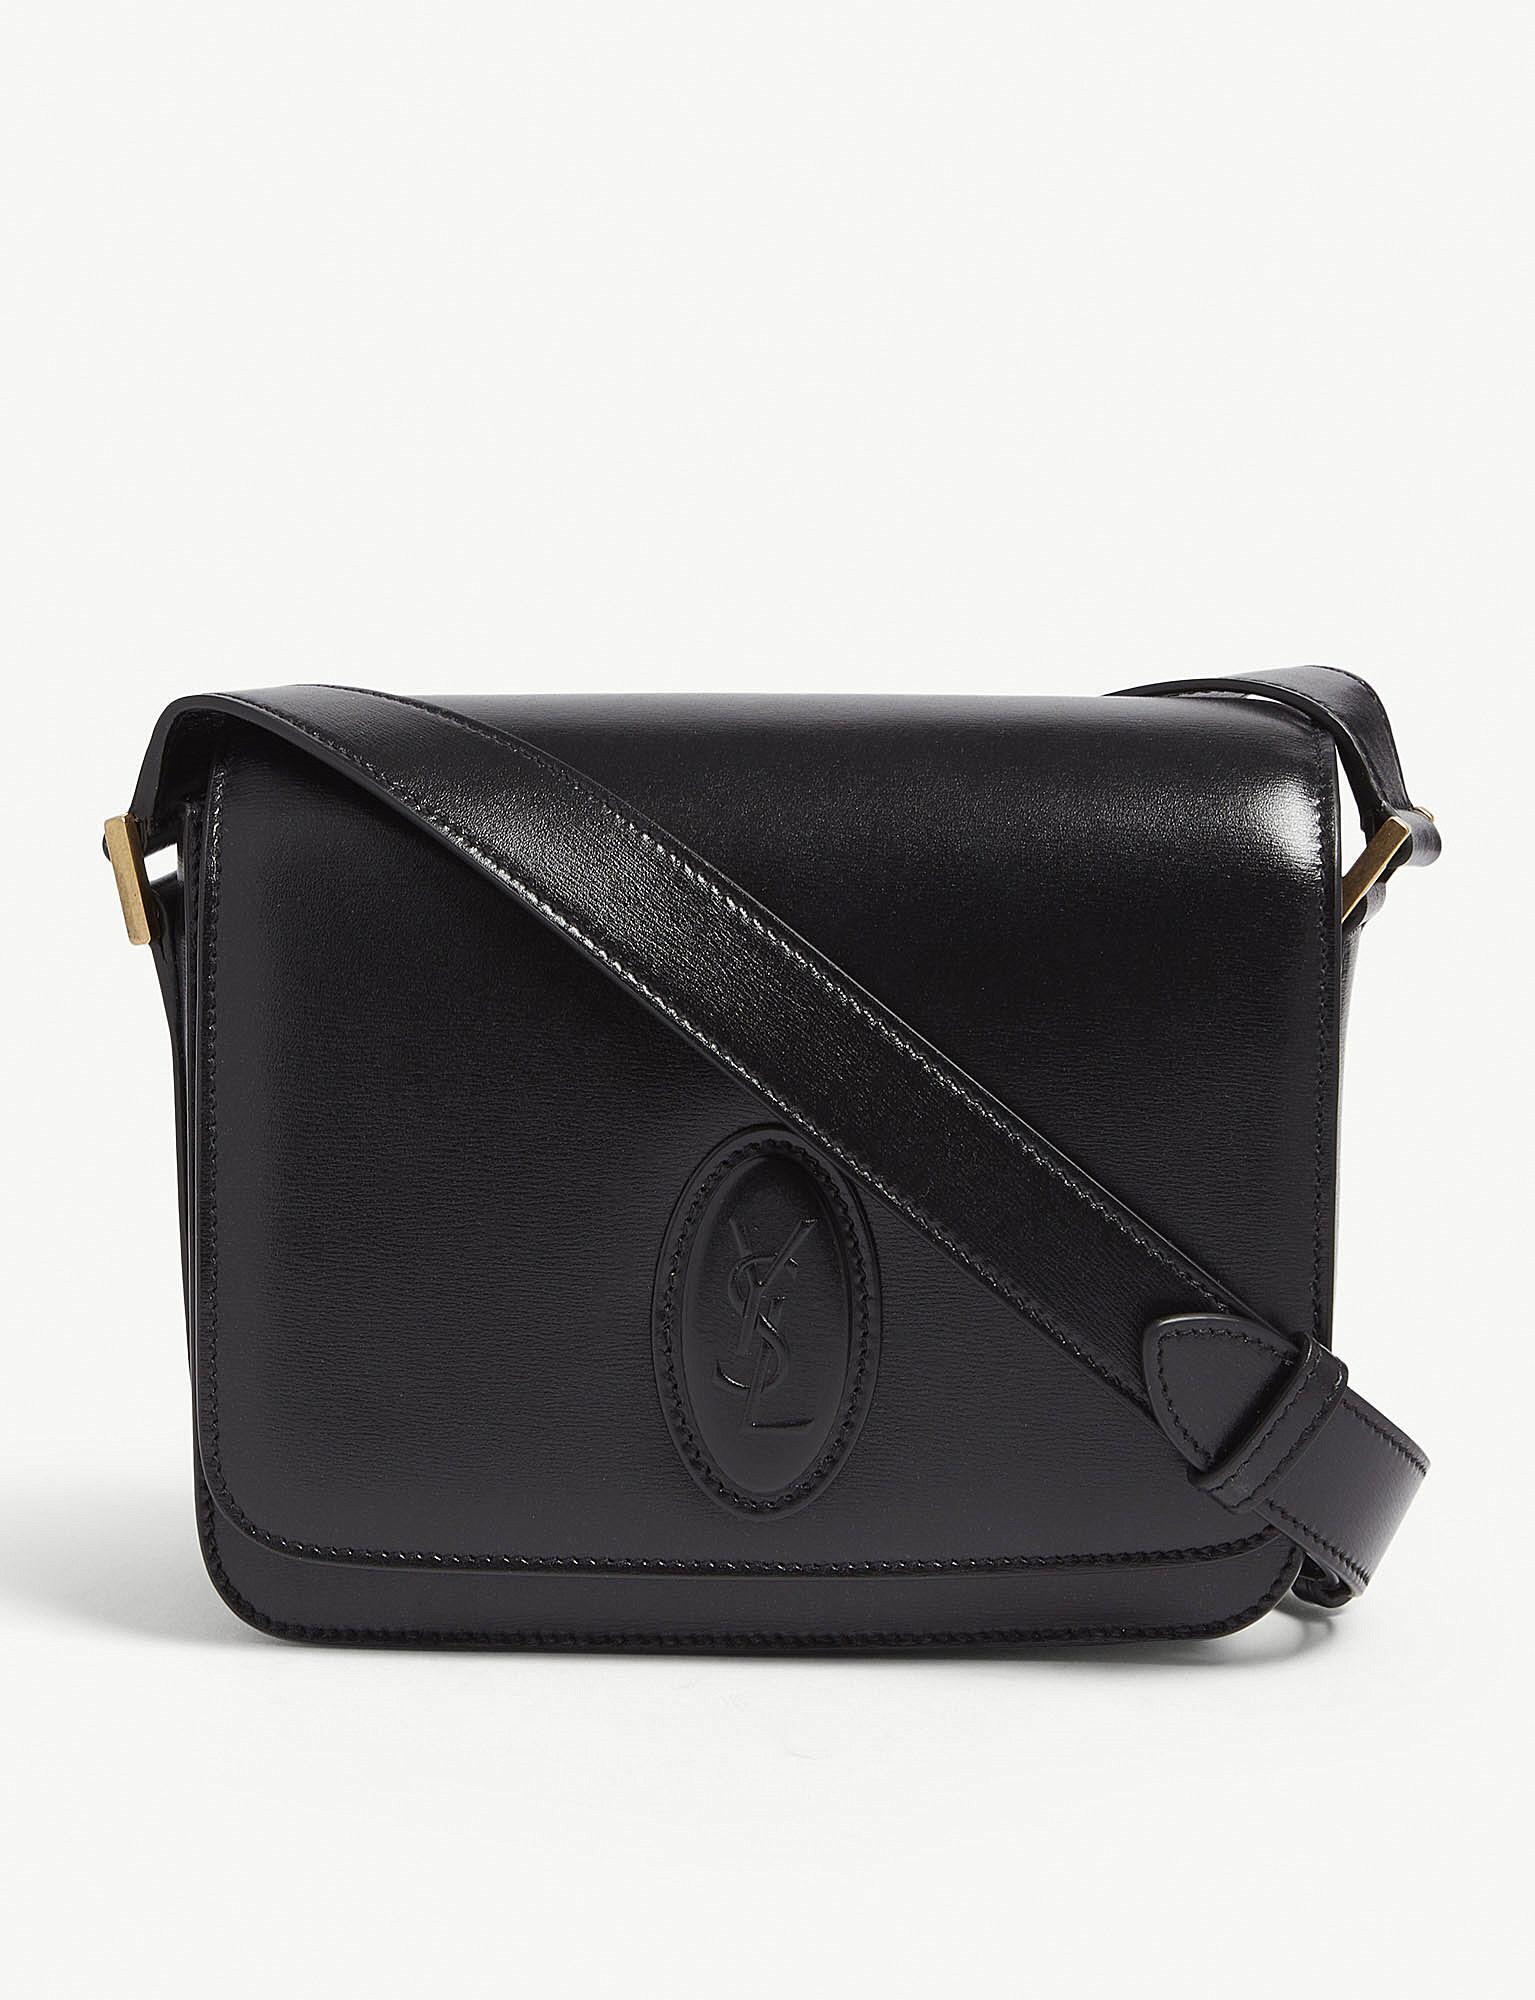 Lyst - Saint Laurent Besace Small Leather Shoulder Bag in Black e49524c2fc650